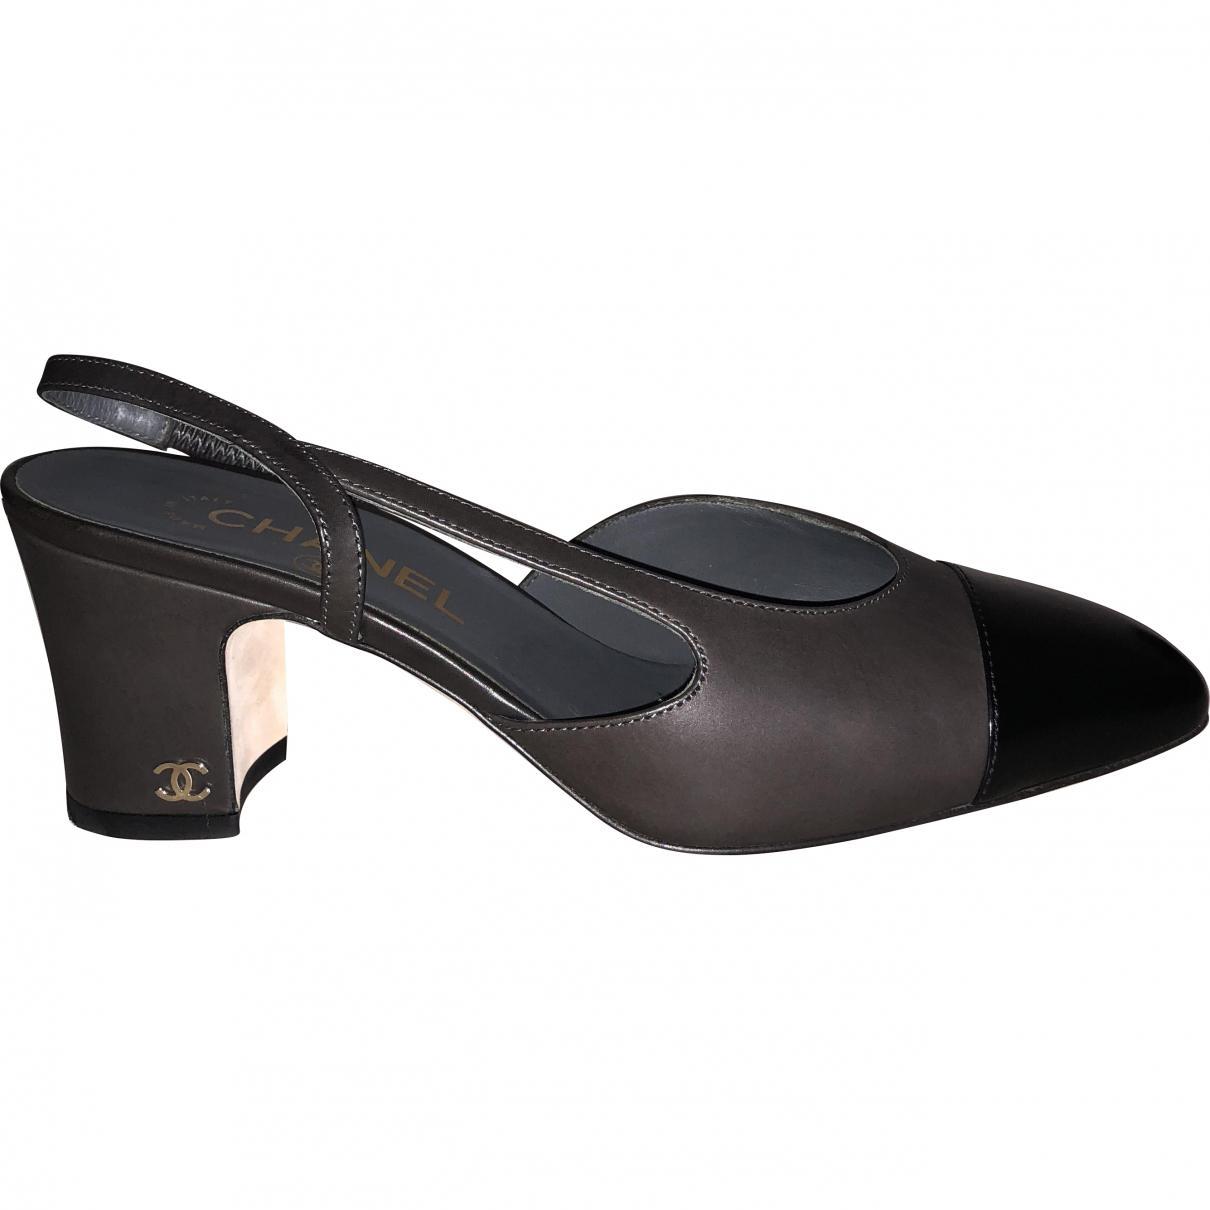 344e5a8a5cd Chanel Slingback Multicolour Leather Heels - Lyst